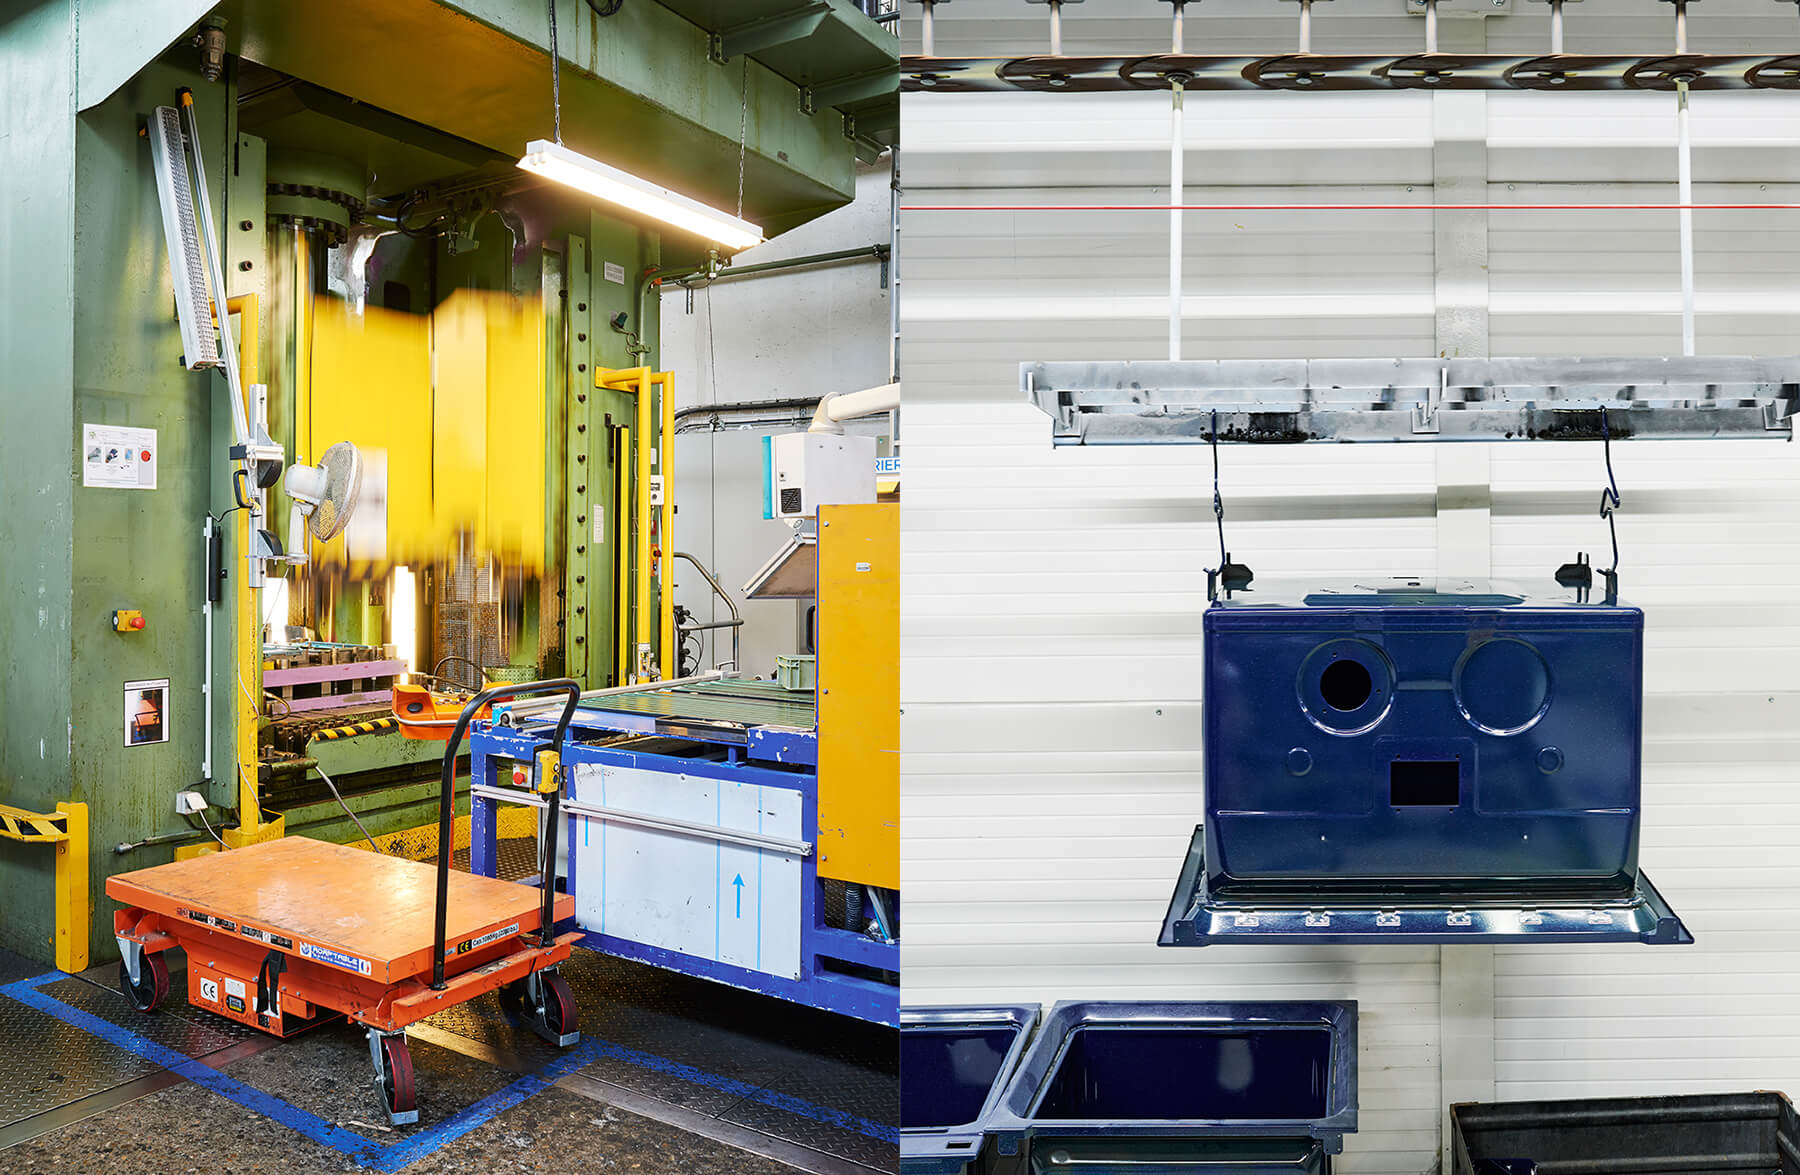 Gaggenau factory Lipsheim as featured in Disegno magazine 12